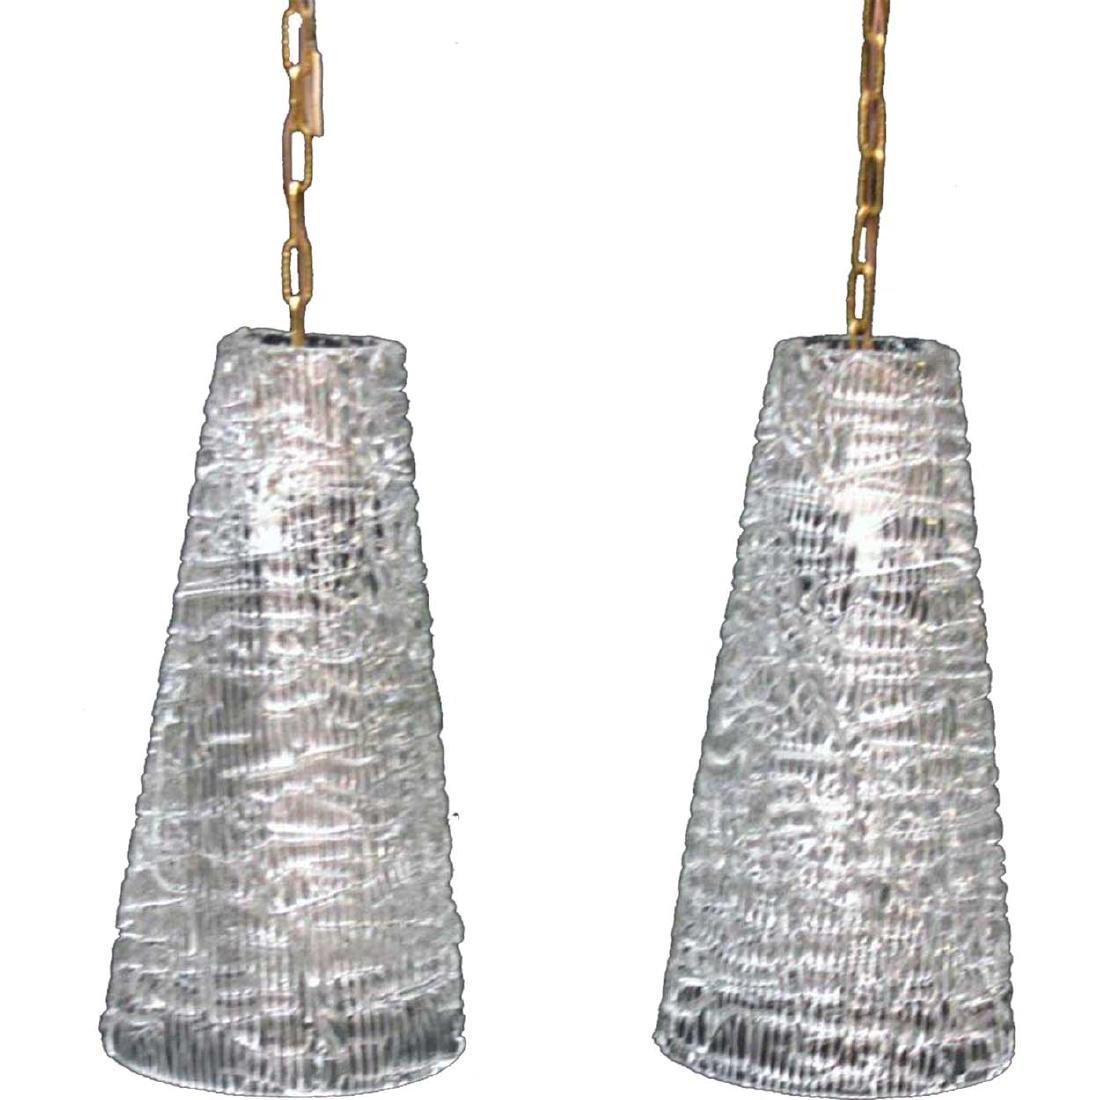 Pair Swedish CARL FAGERLUND for Orrefors Pendant Lights